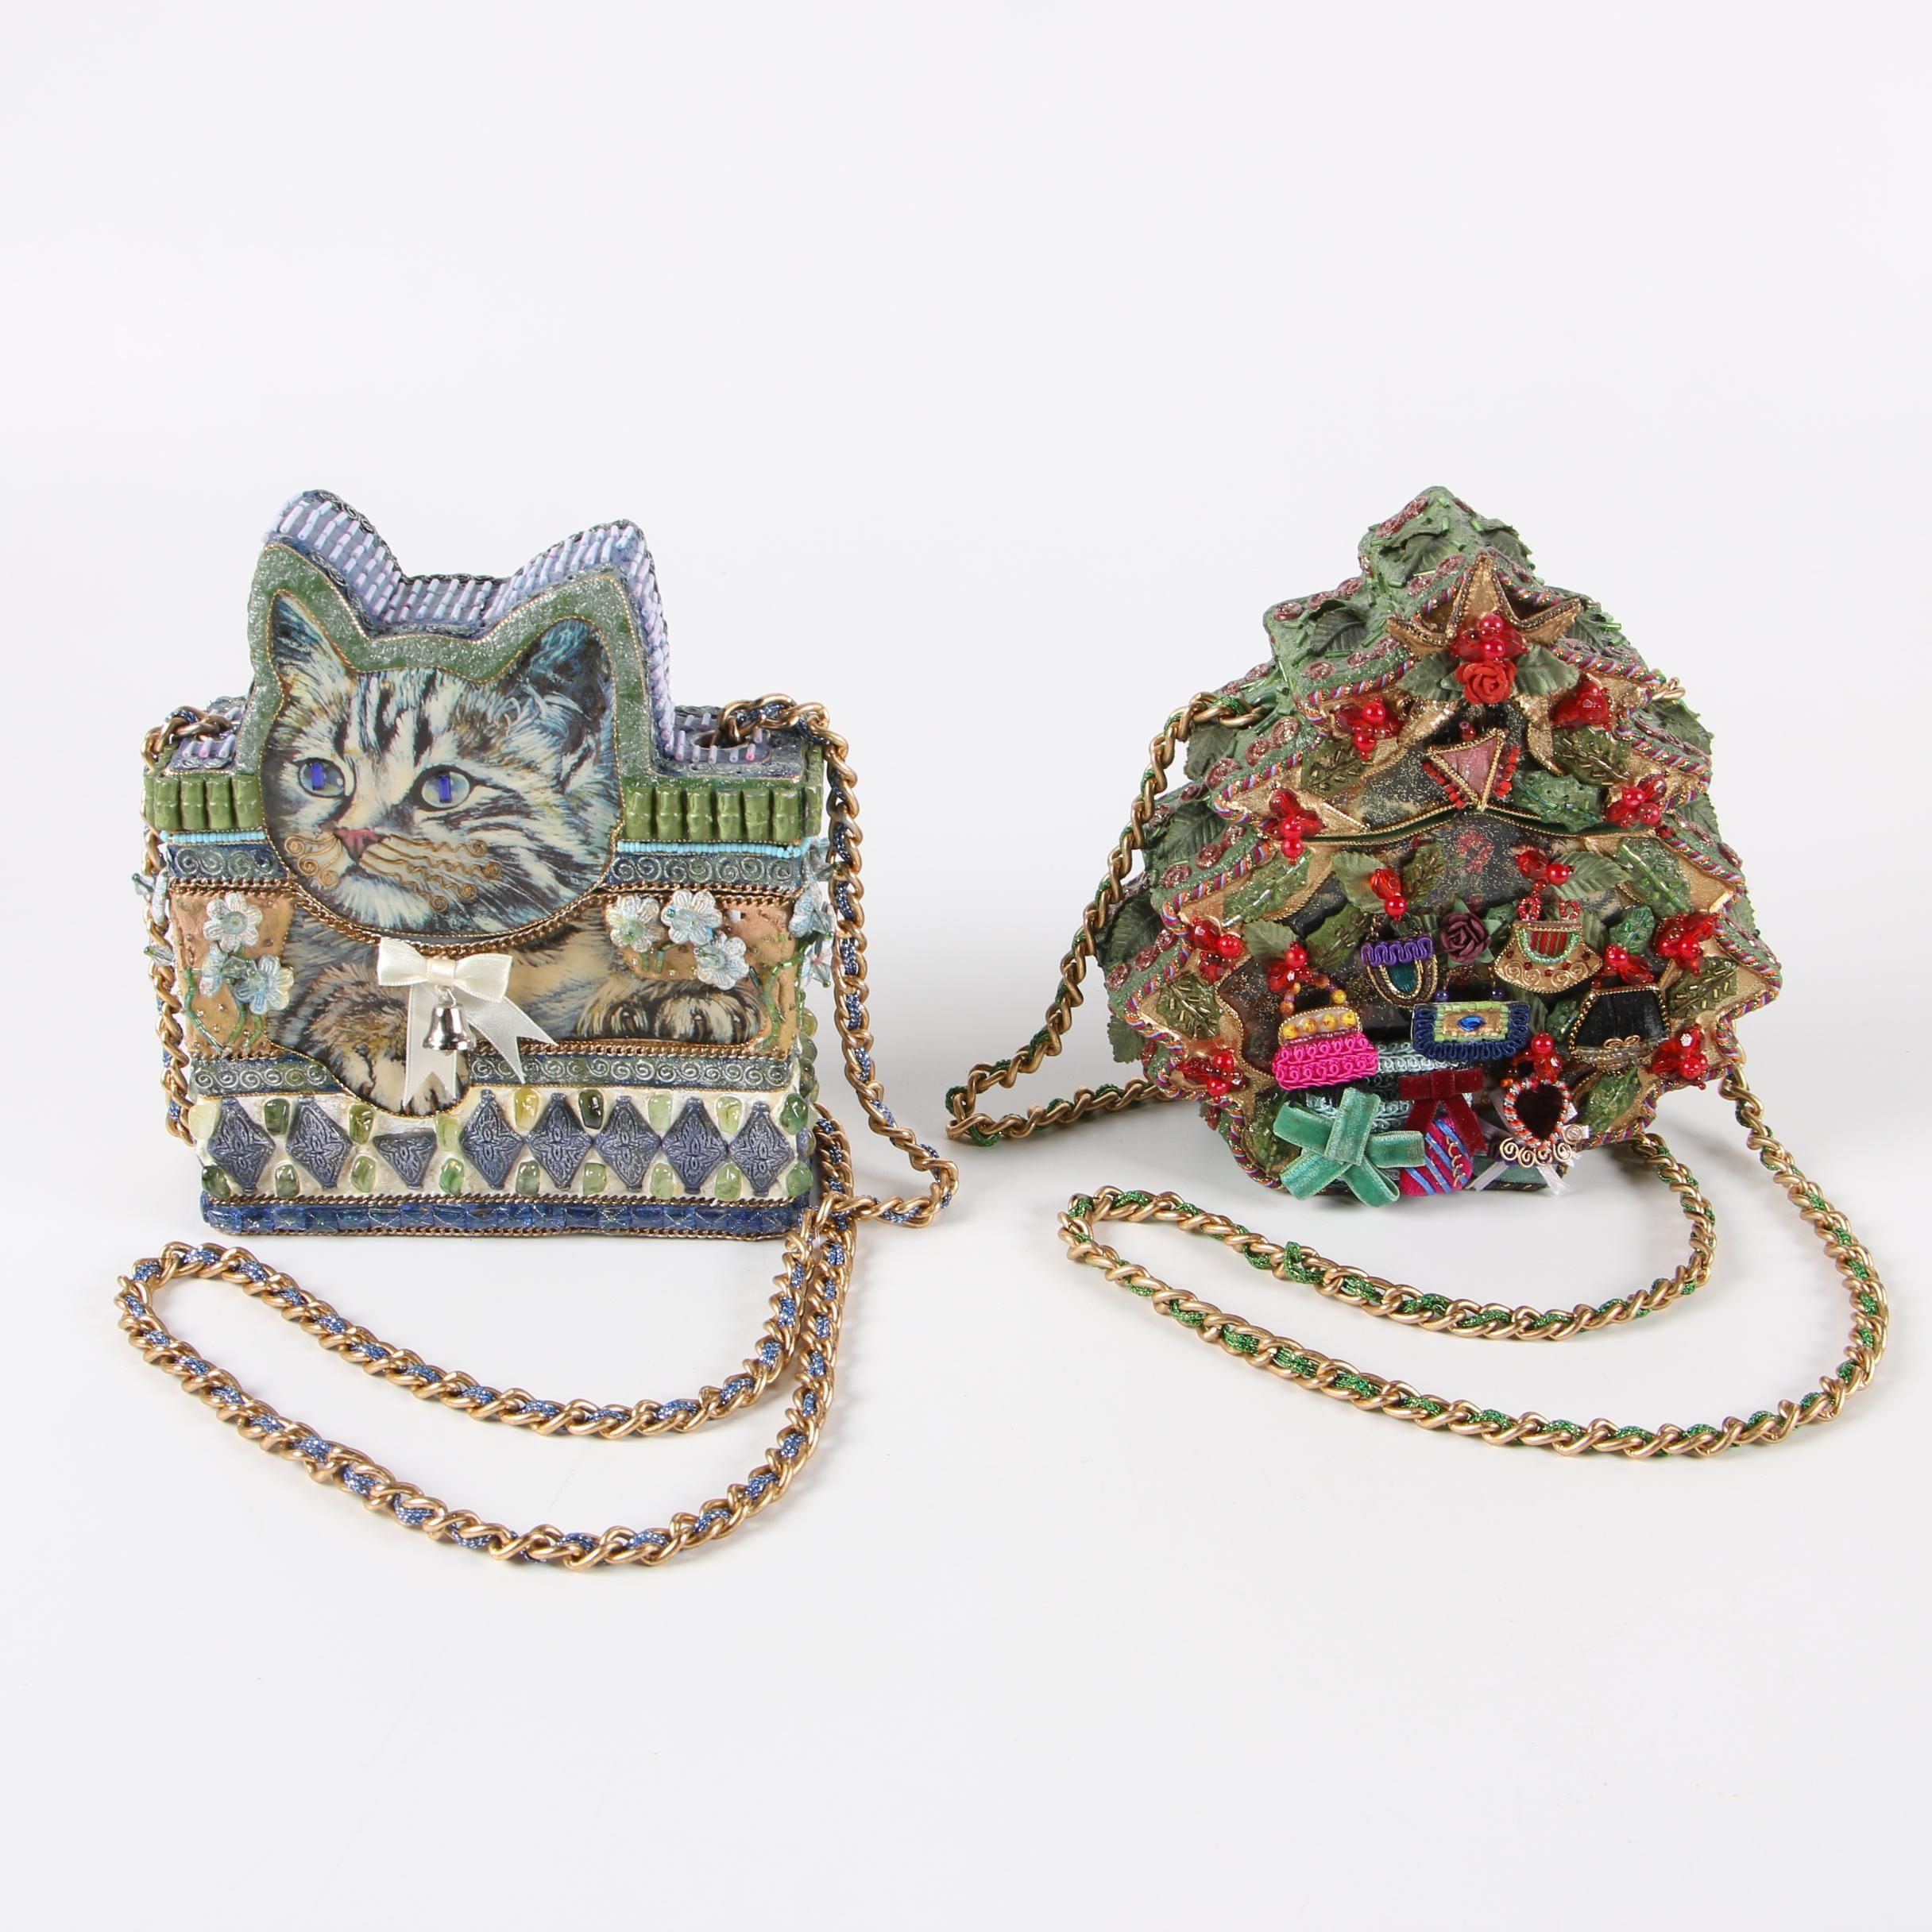 1990s Mary Frances Cat and Christmas Tree Themed Decorated Box Handbags